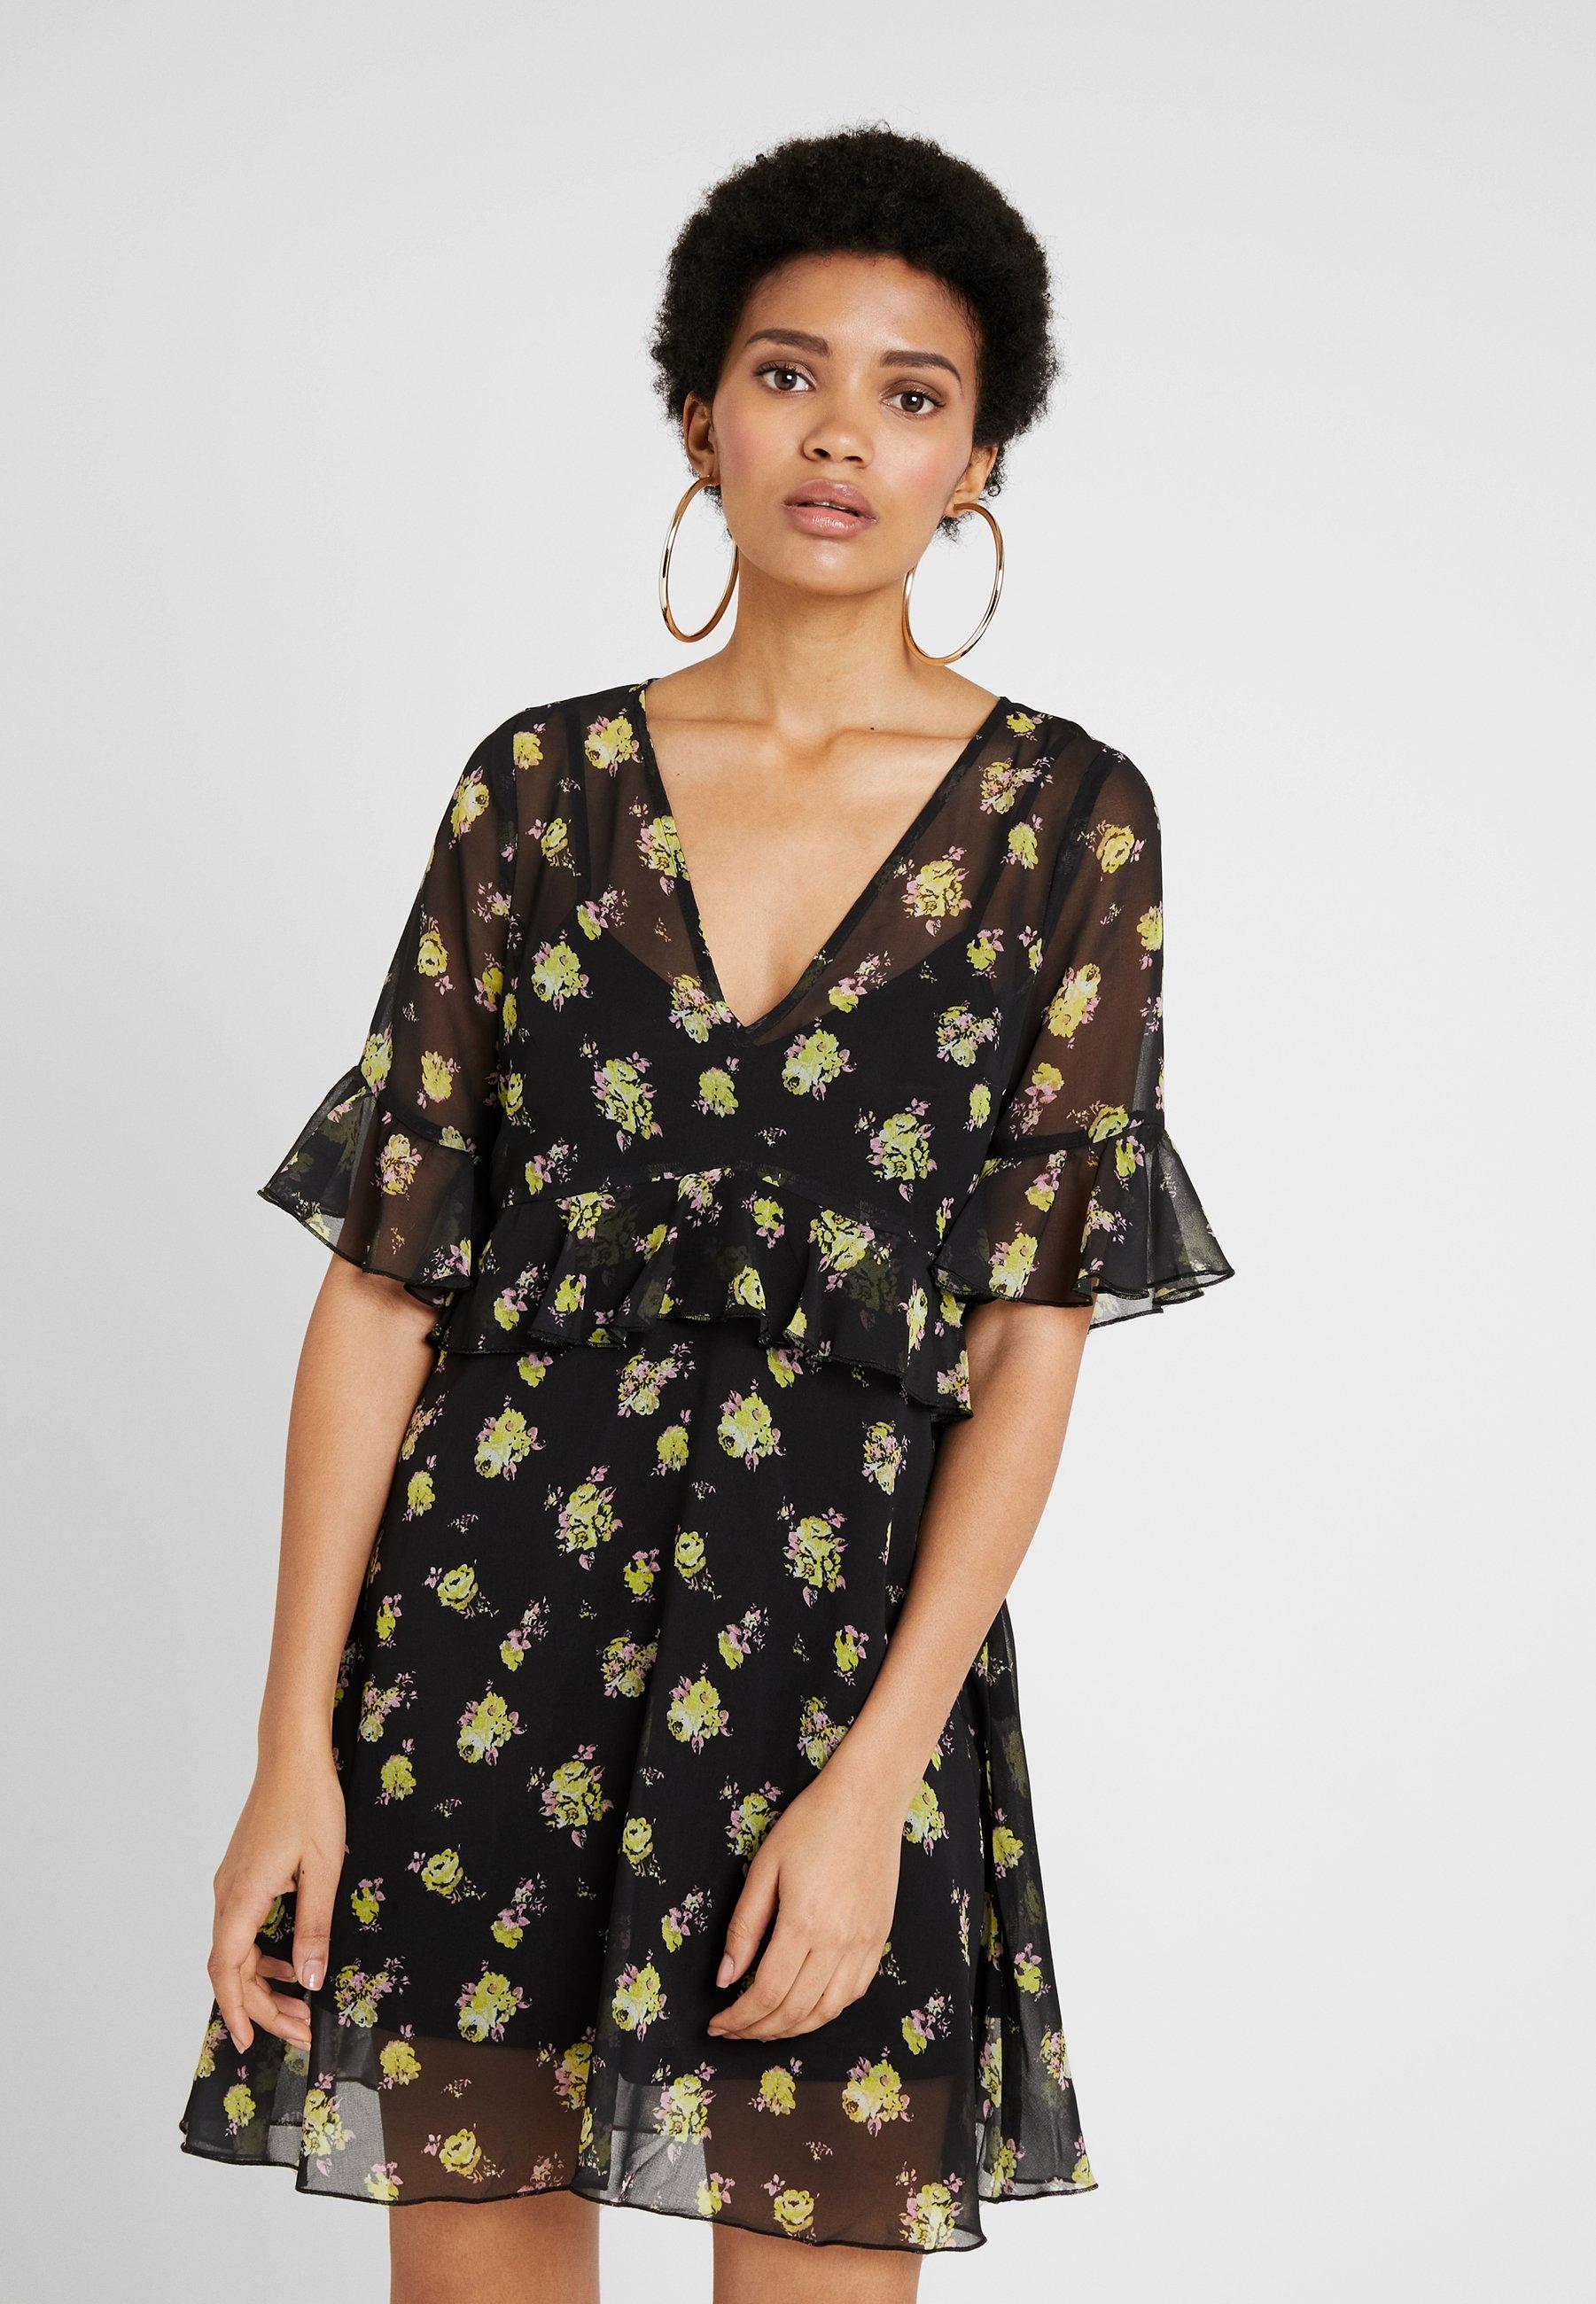 Na DressRobe Ruffle kd Floral D'été Black yellow N0OynwPmv8